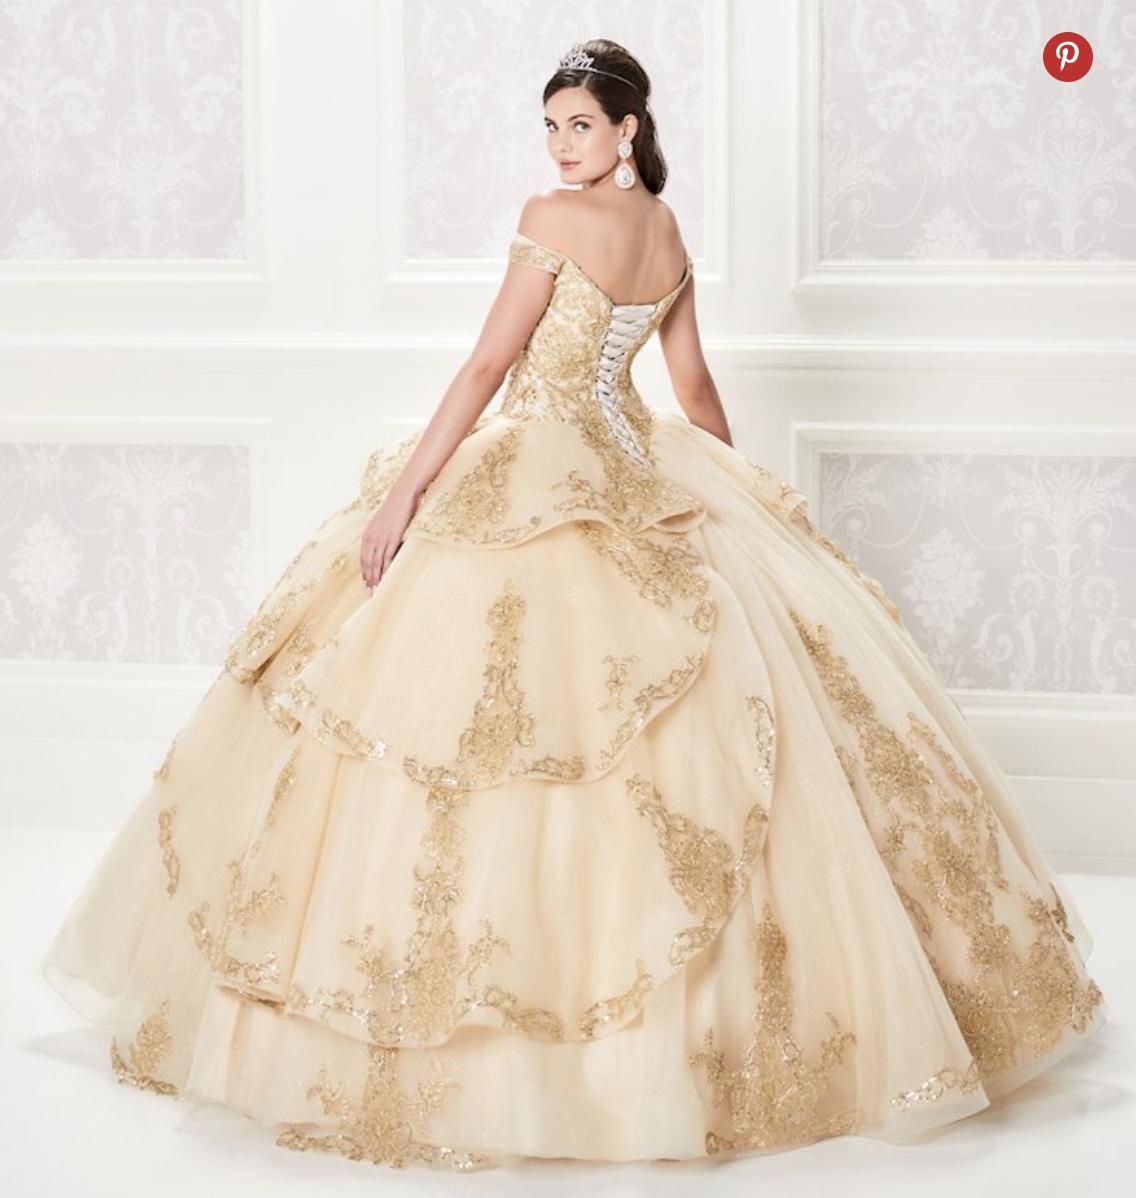 Princesa By Ariana Vara PR21962